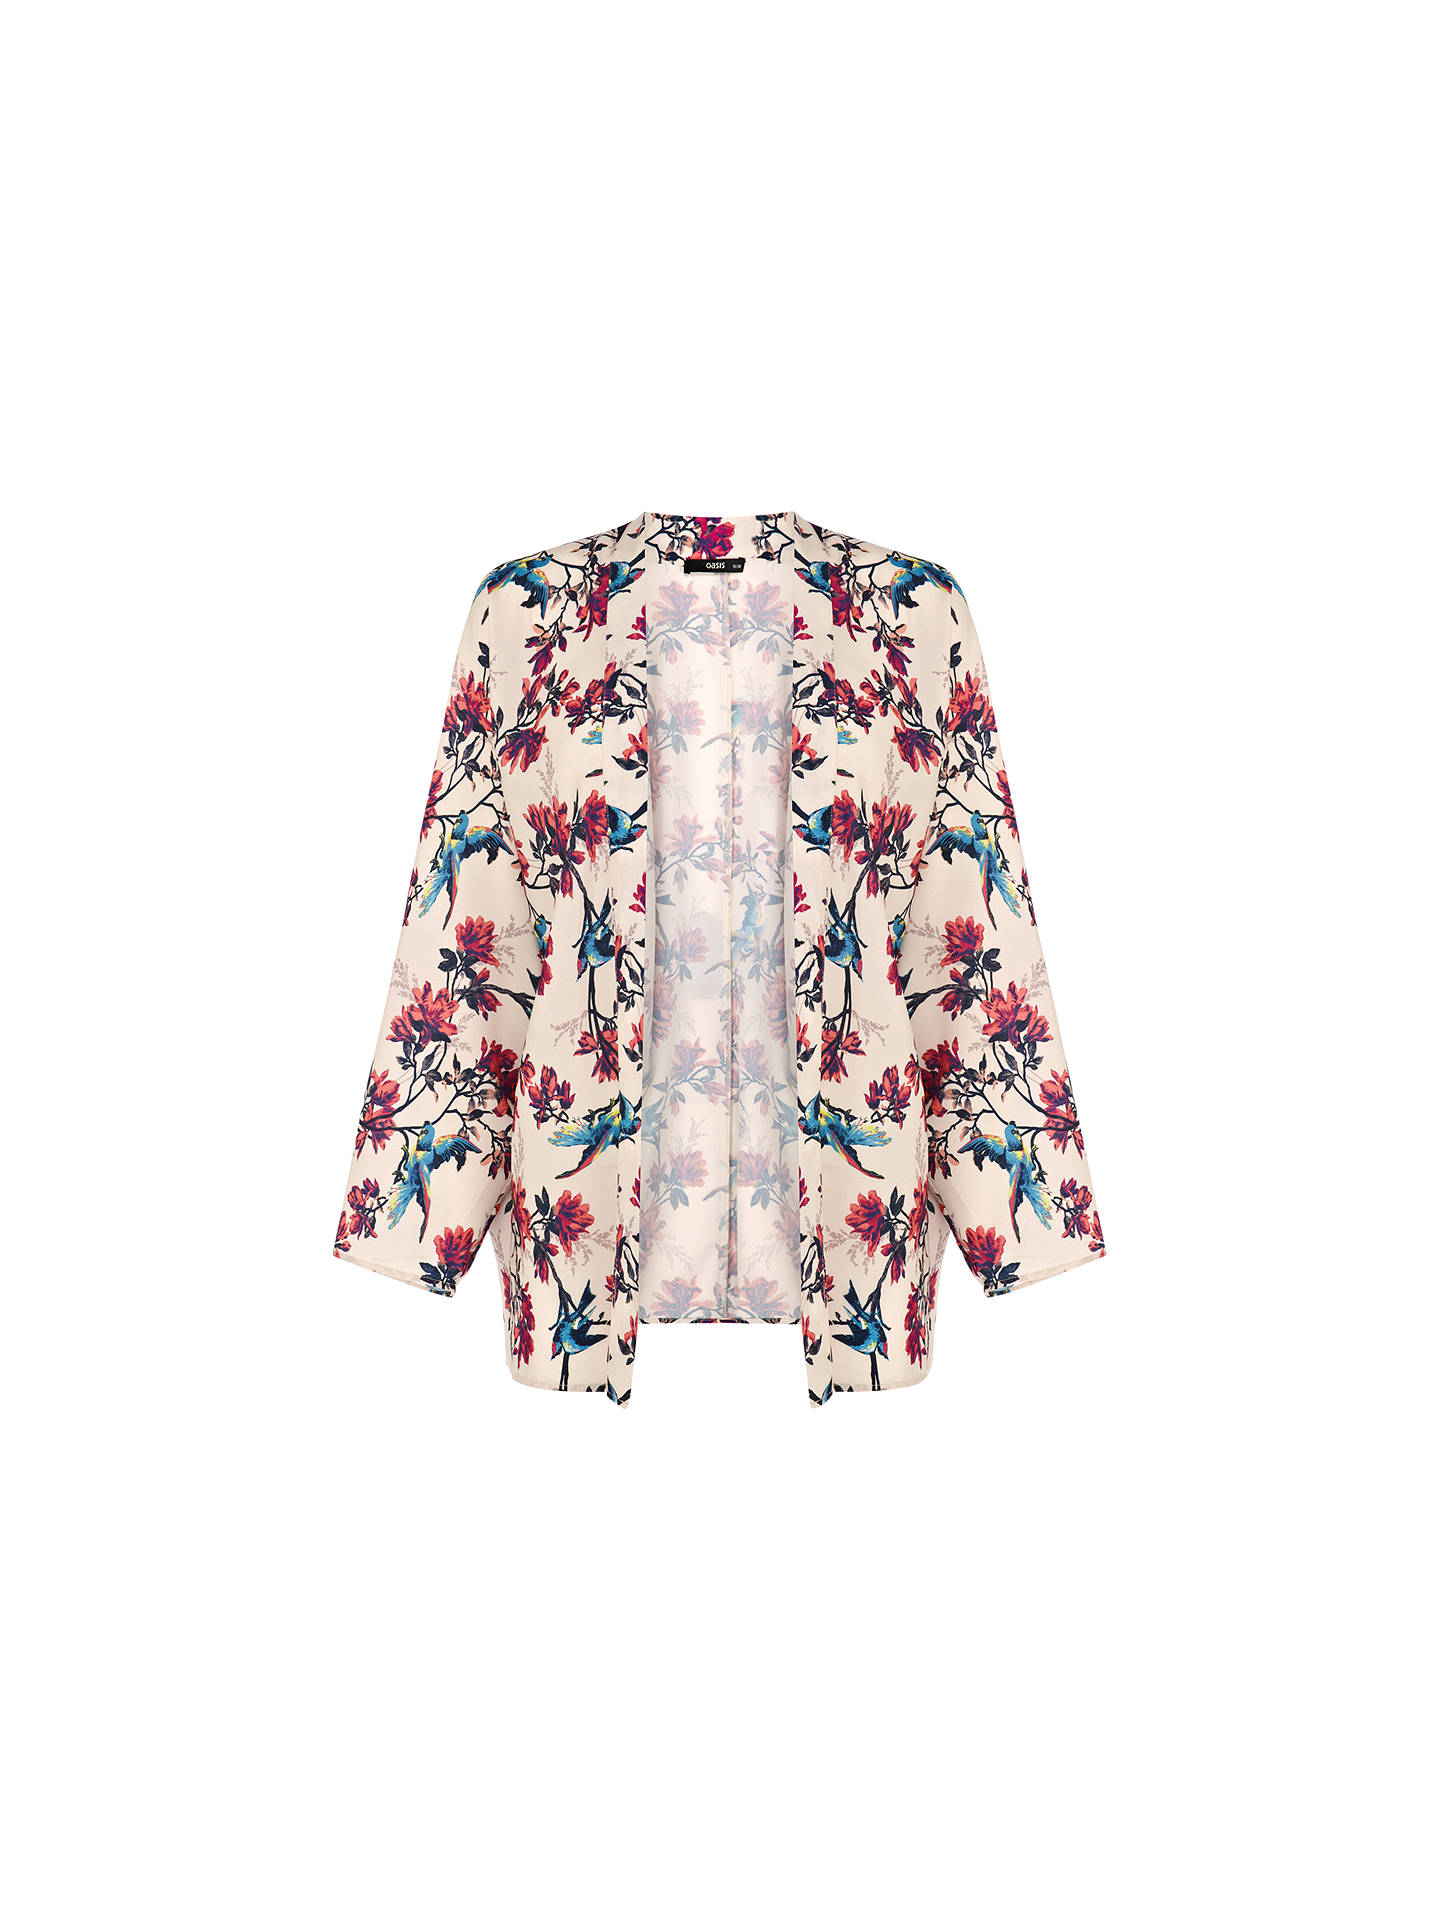 8a0b3becb550 Buy Oasis Bird Kimono Jacket, Off White, 8 Online at johnlewis.com ...